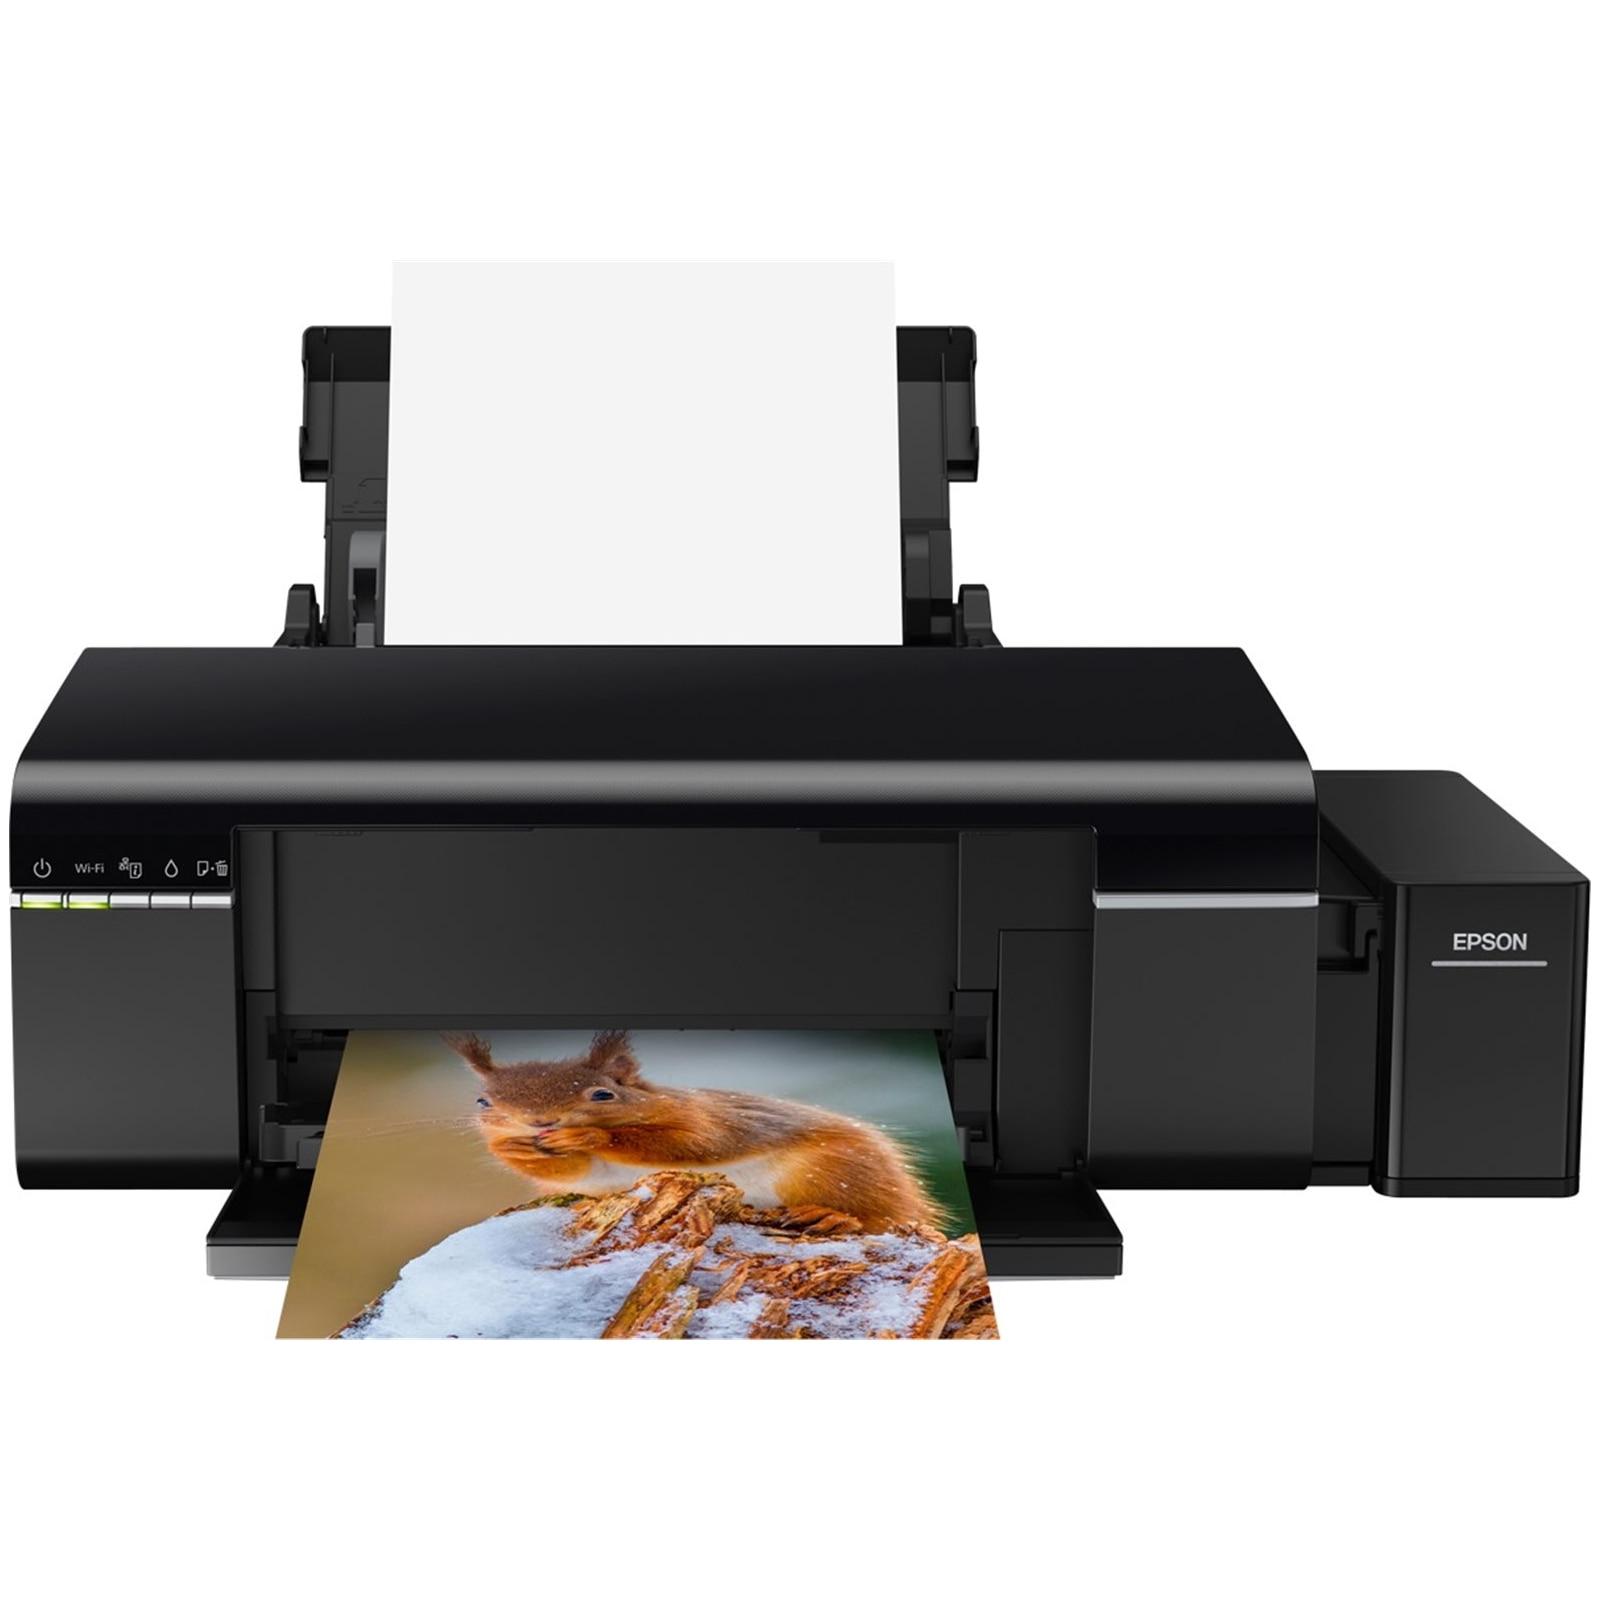 Fotografie Imprimanta InkJet Color Epson L805 CISS, A4, Wireless